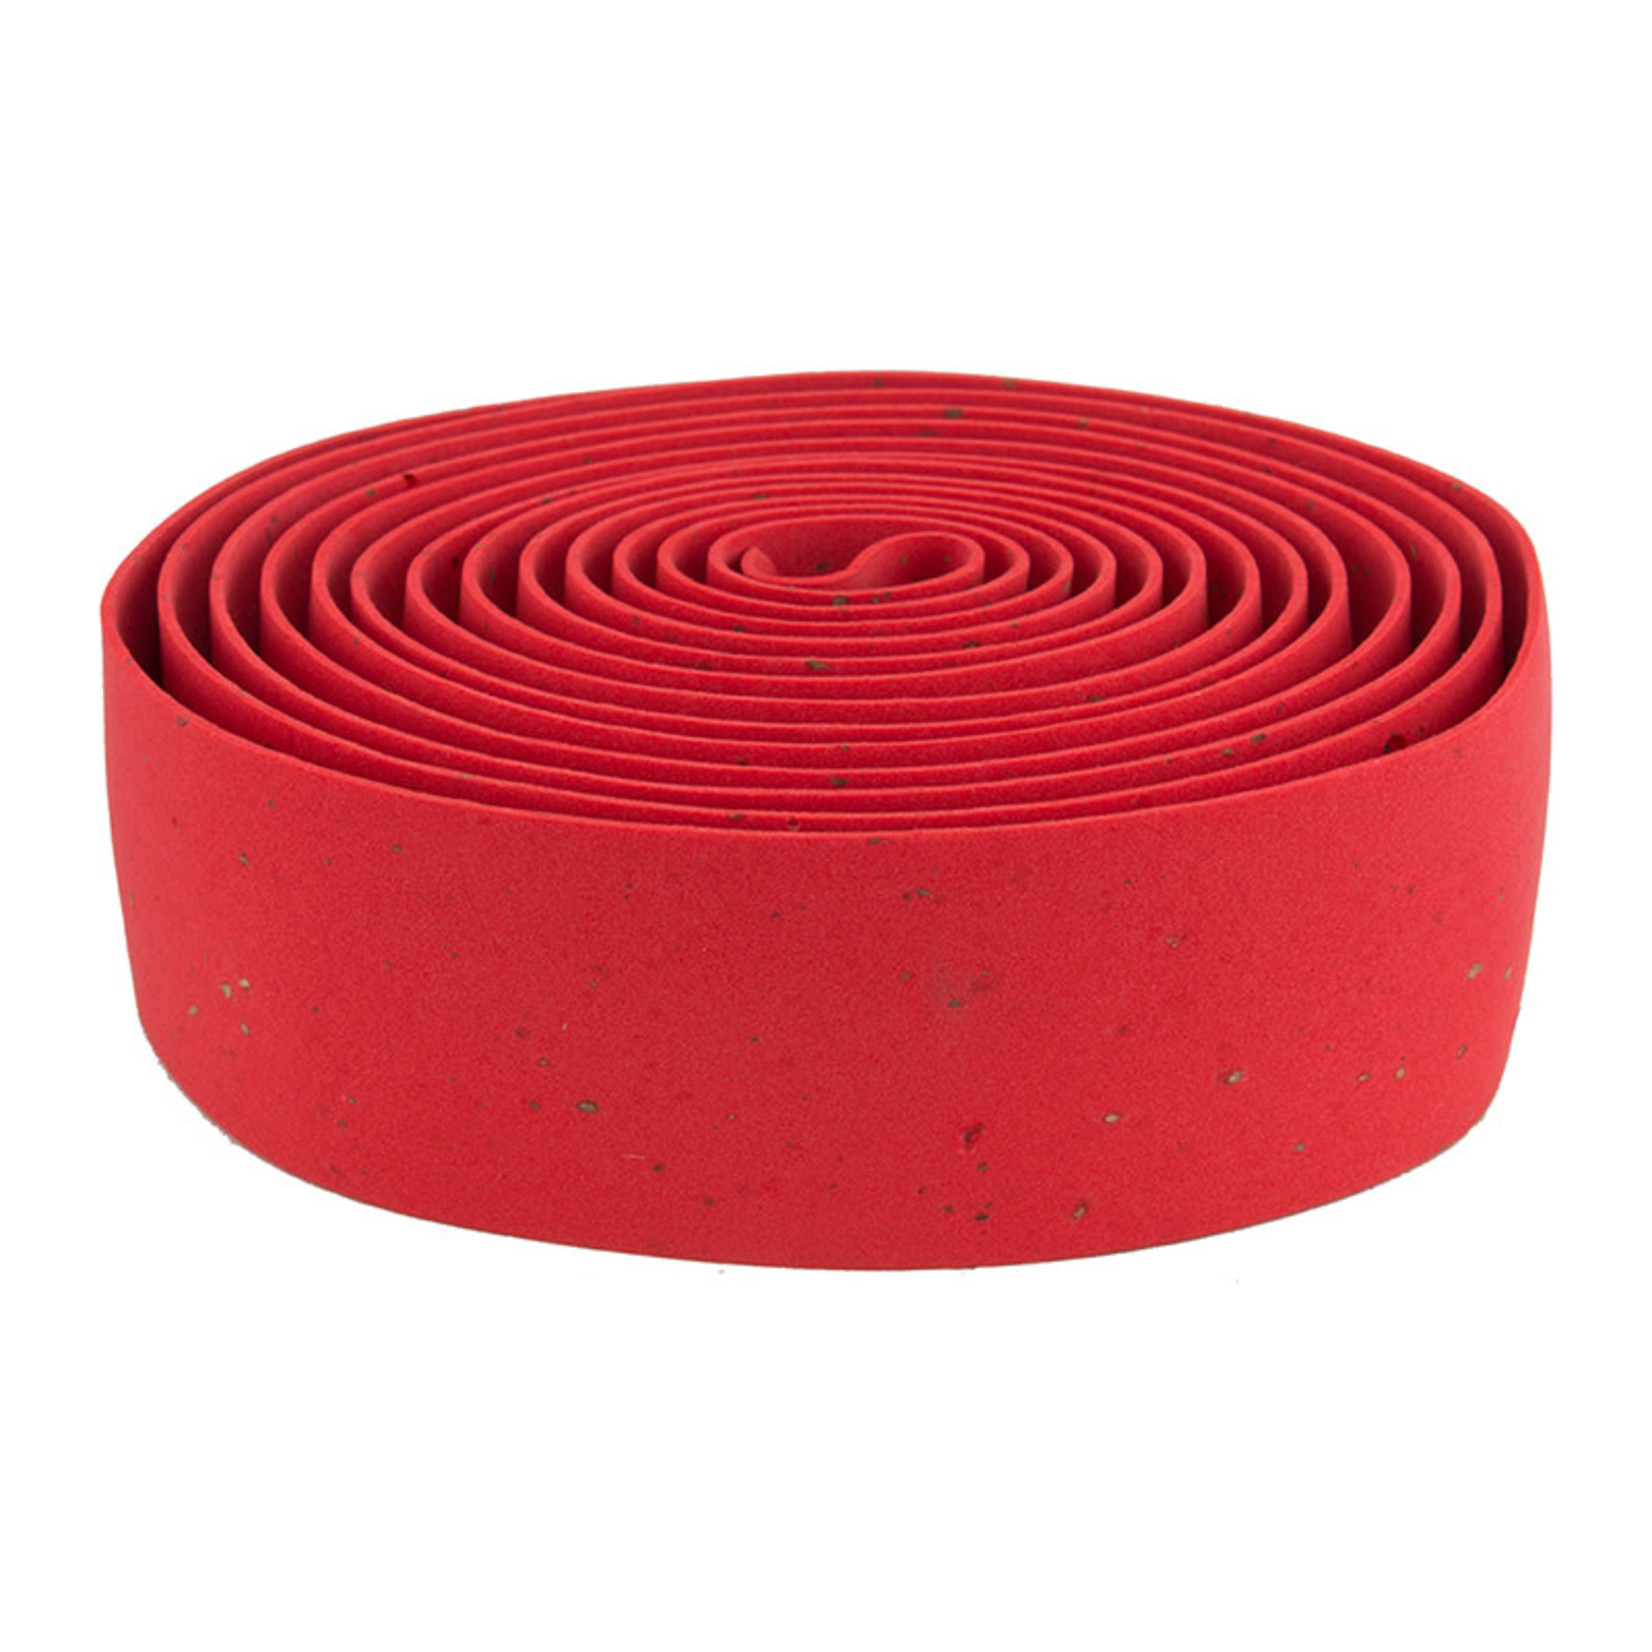 TAPE & PLUGS OR8 CORK RED